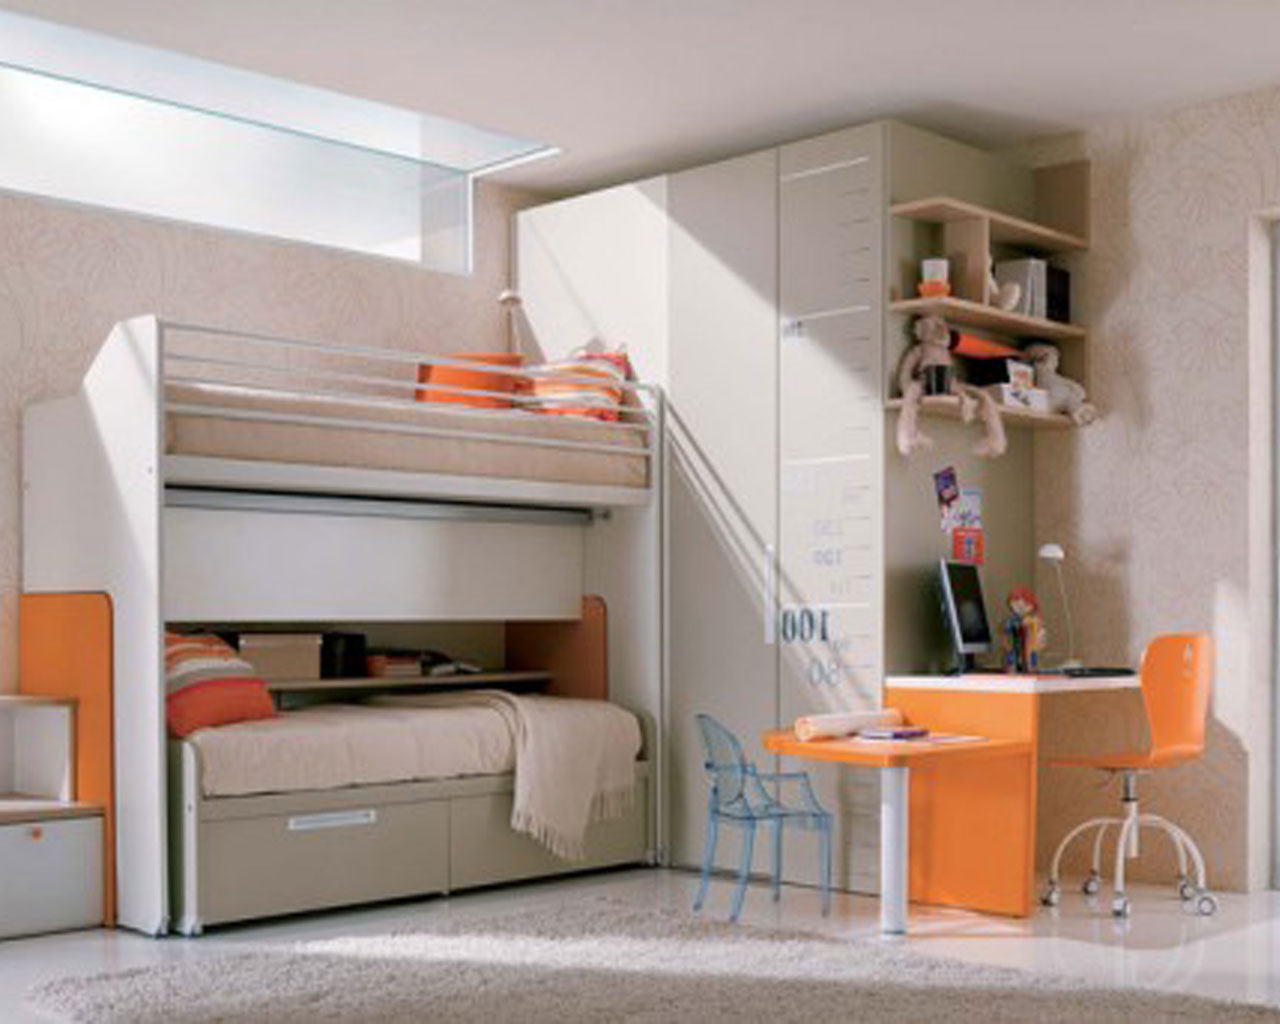 Simple White Providing Sanctuary In Teenage Girl Bedroom (Image 10 of 10)